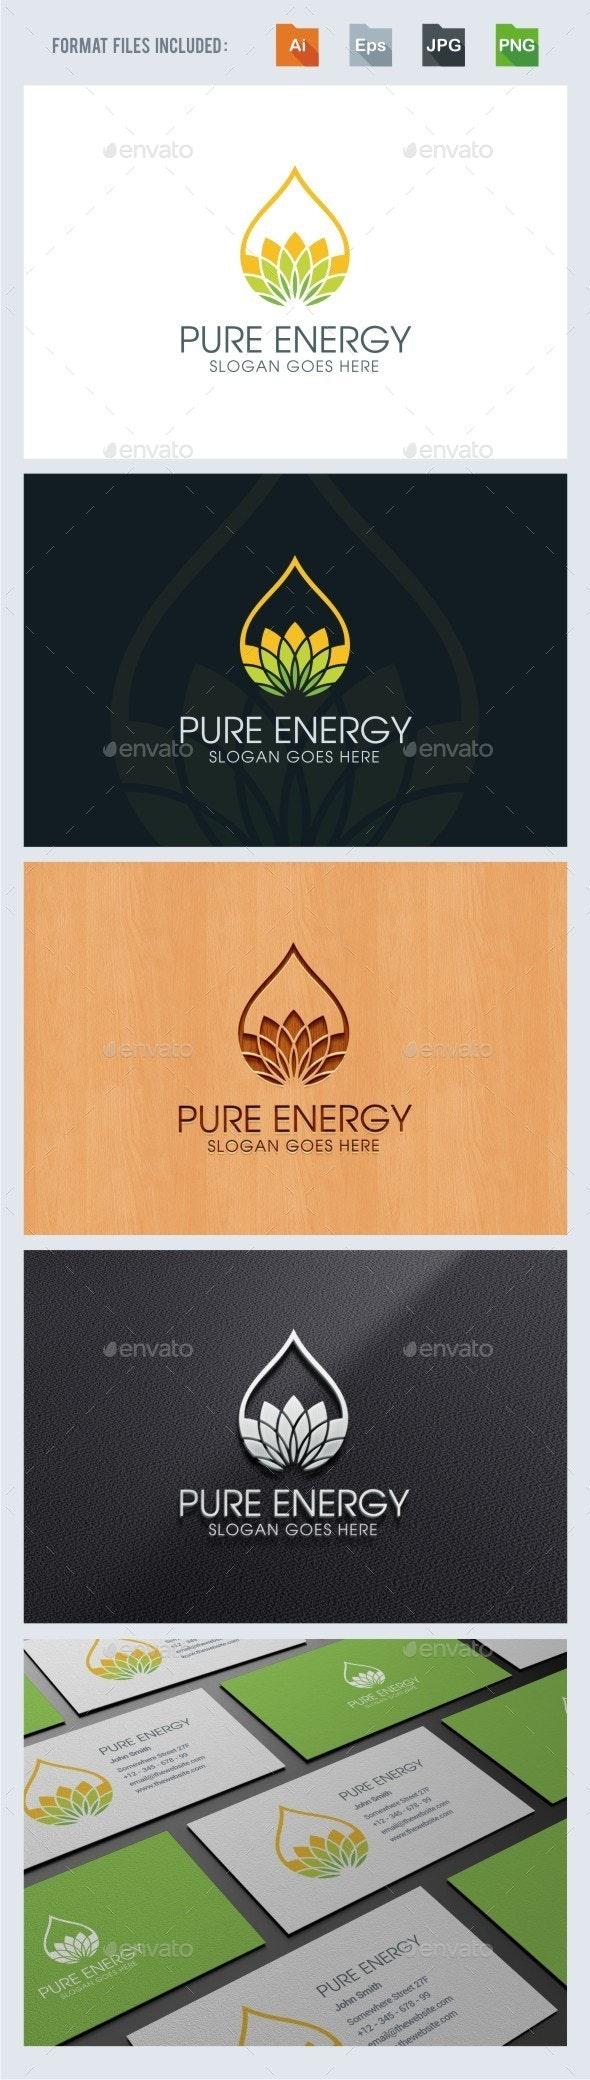 Pure - Eco Energy Logo Template - Nature Logo Templates